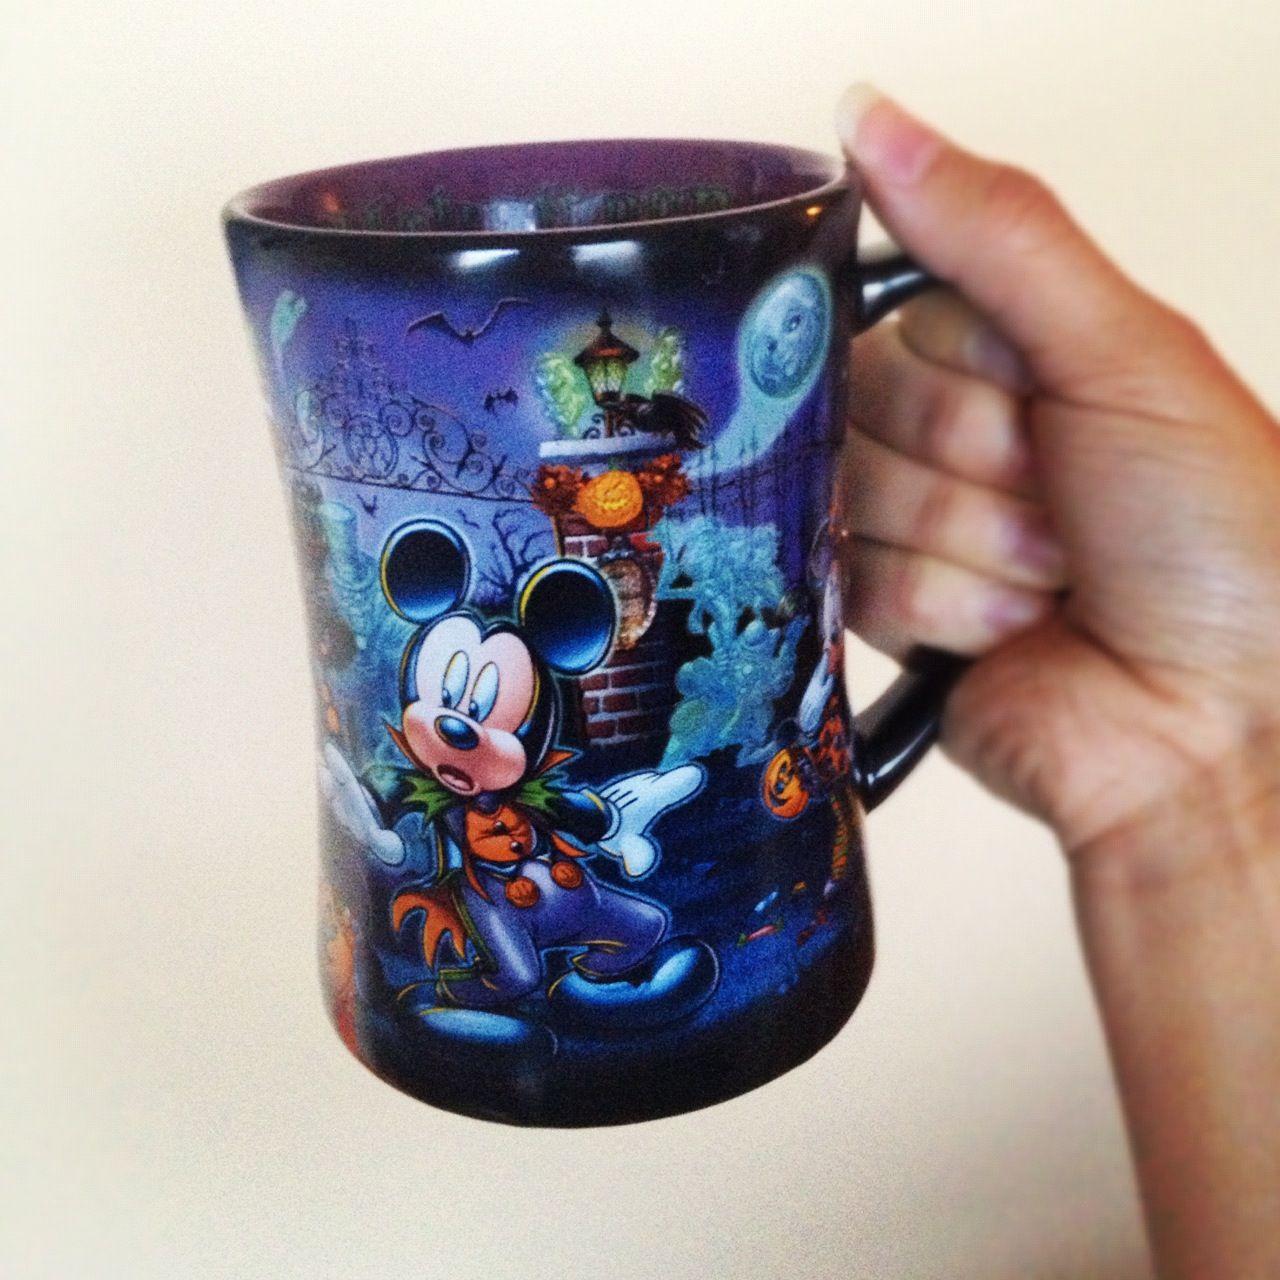 My From New In Pumpkin Spice Coffee Loving Mug Mickey's 1JlFKTc3